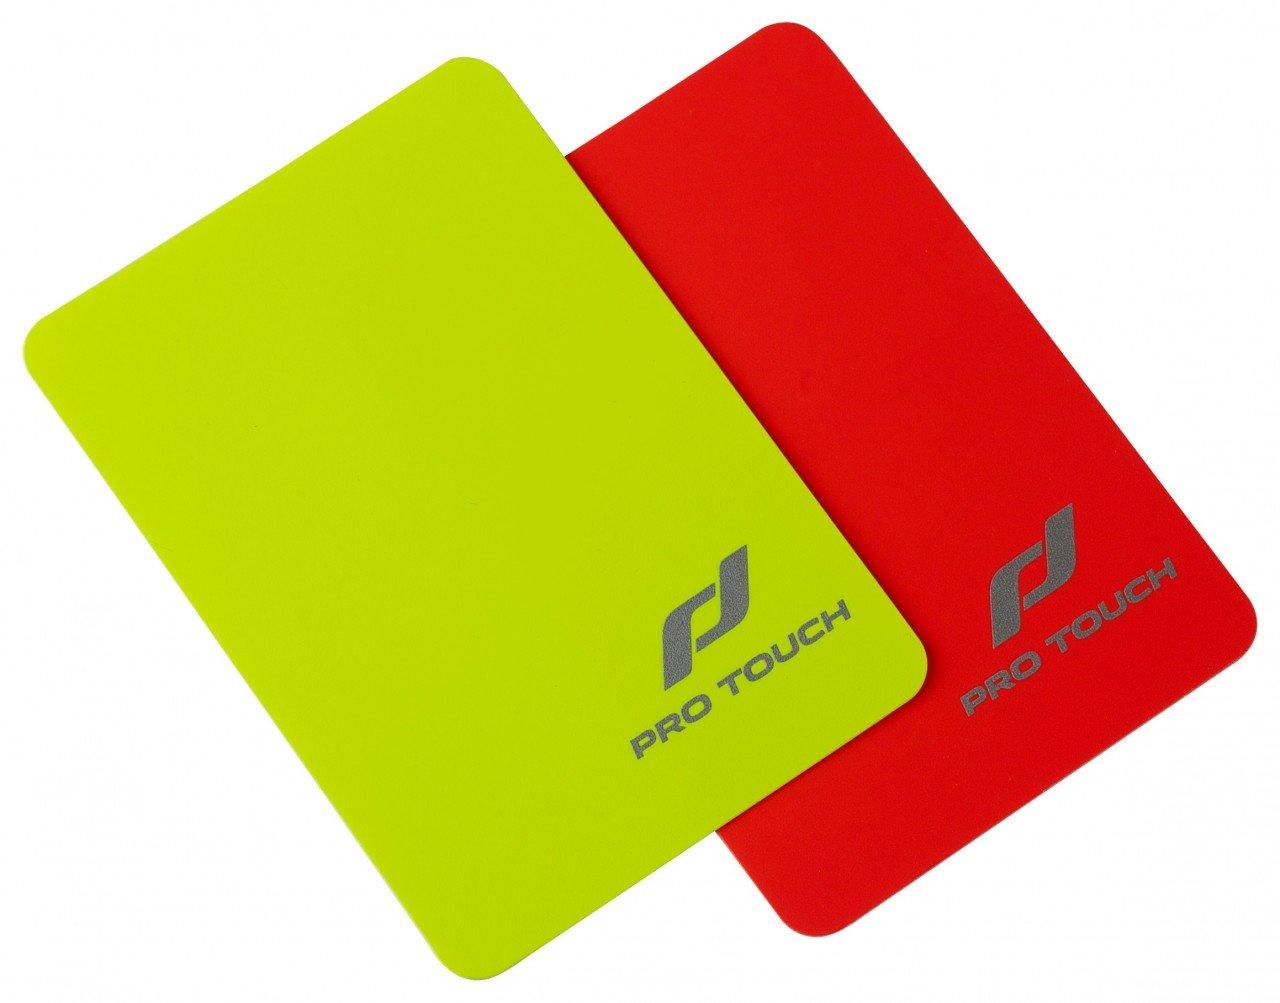 Pro Touch Intersport - Set con 2 cartellini da arbitro - Neutro - _, 1 ADIL0|#adidas 101060